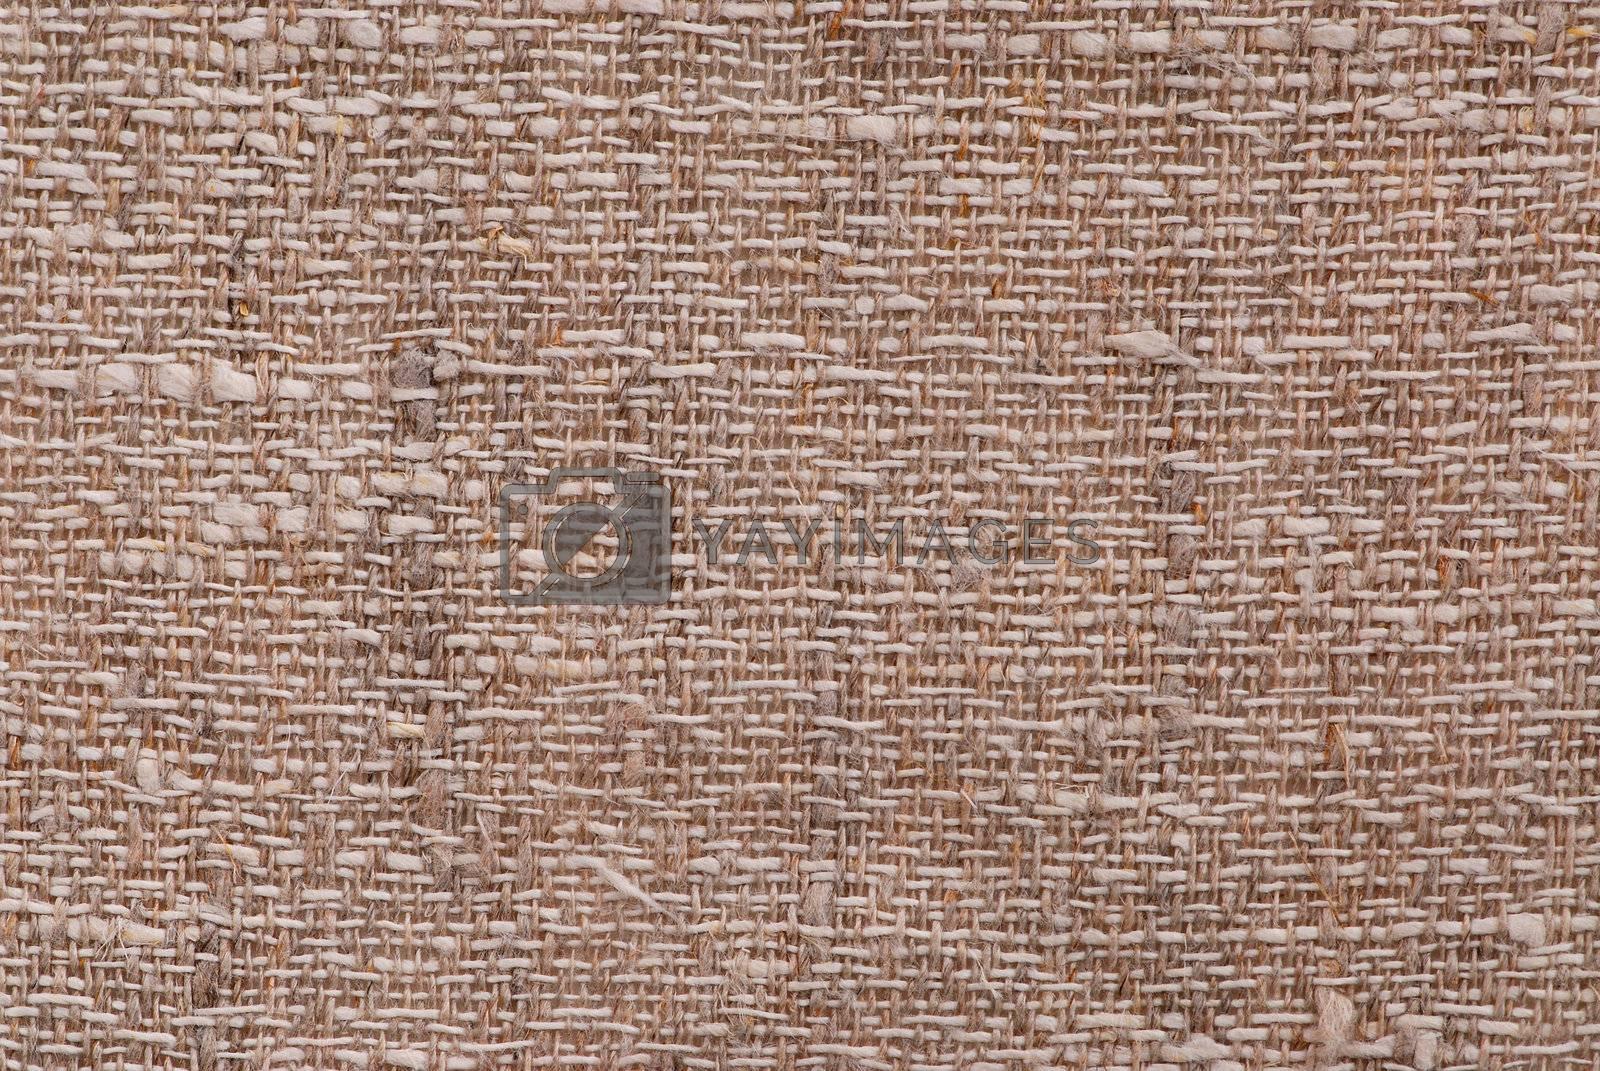 Closeup of a linen fabric texture of natural color